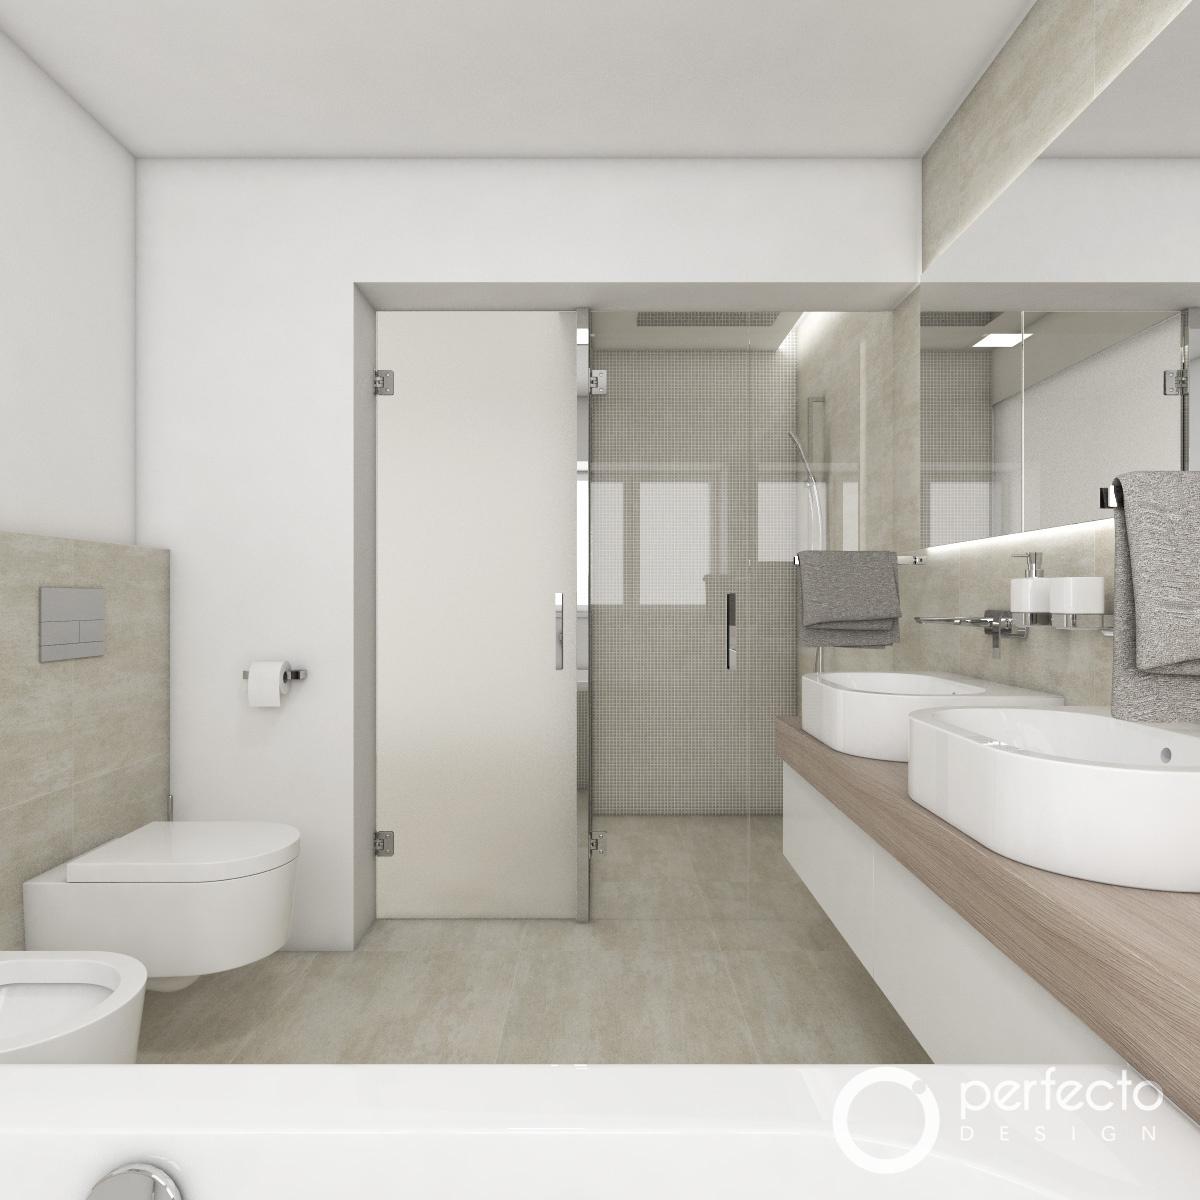 modernes badezimmer imola perfecto design. Black Bedroom Furniture Sets. Home Design Ideas